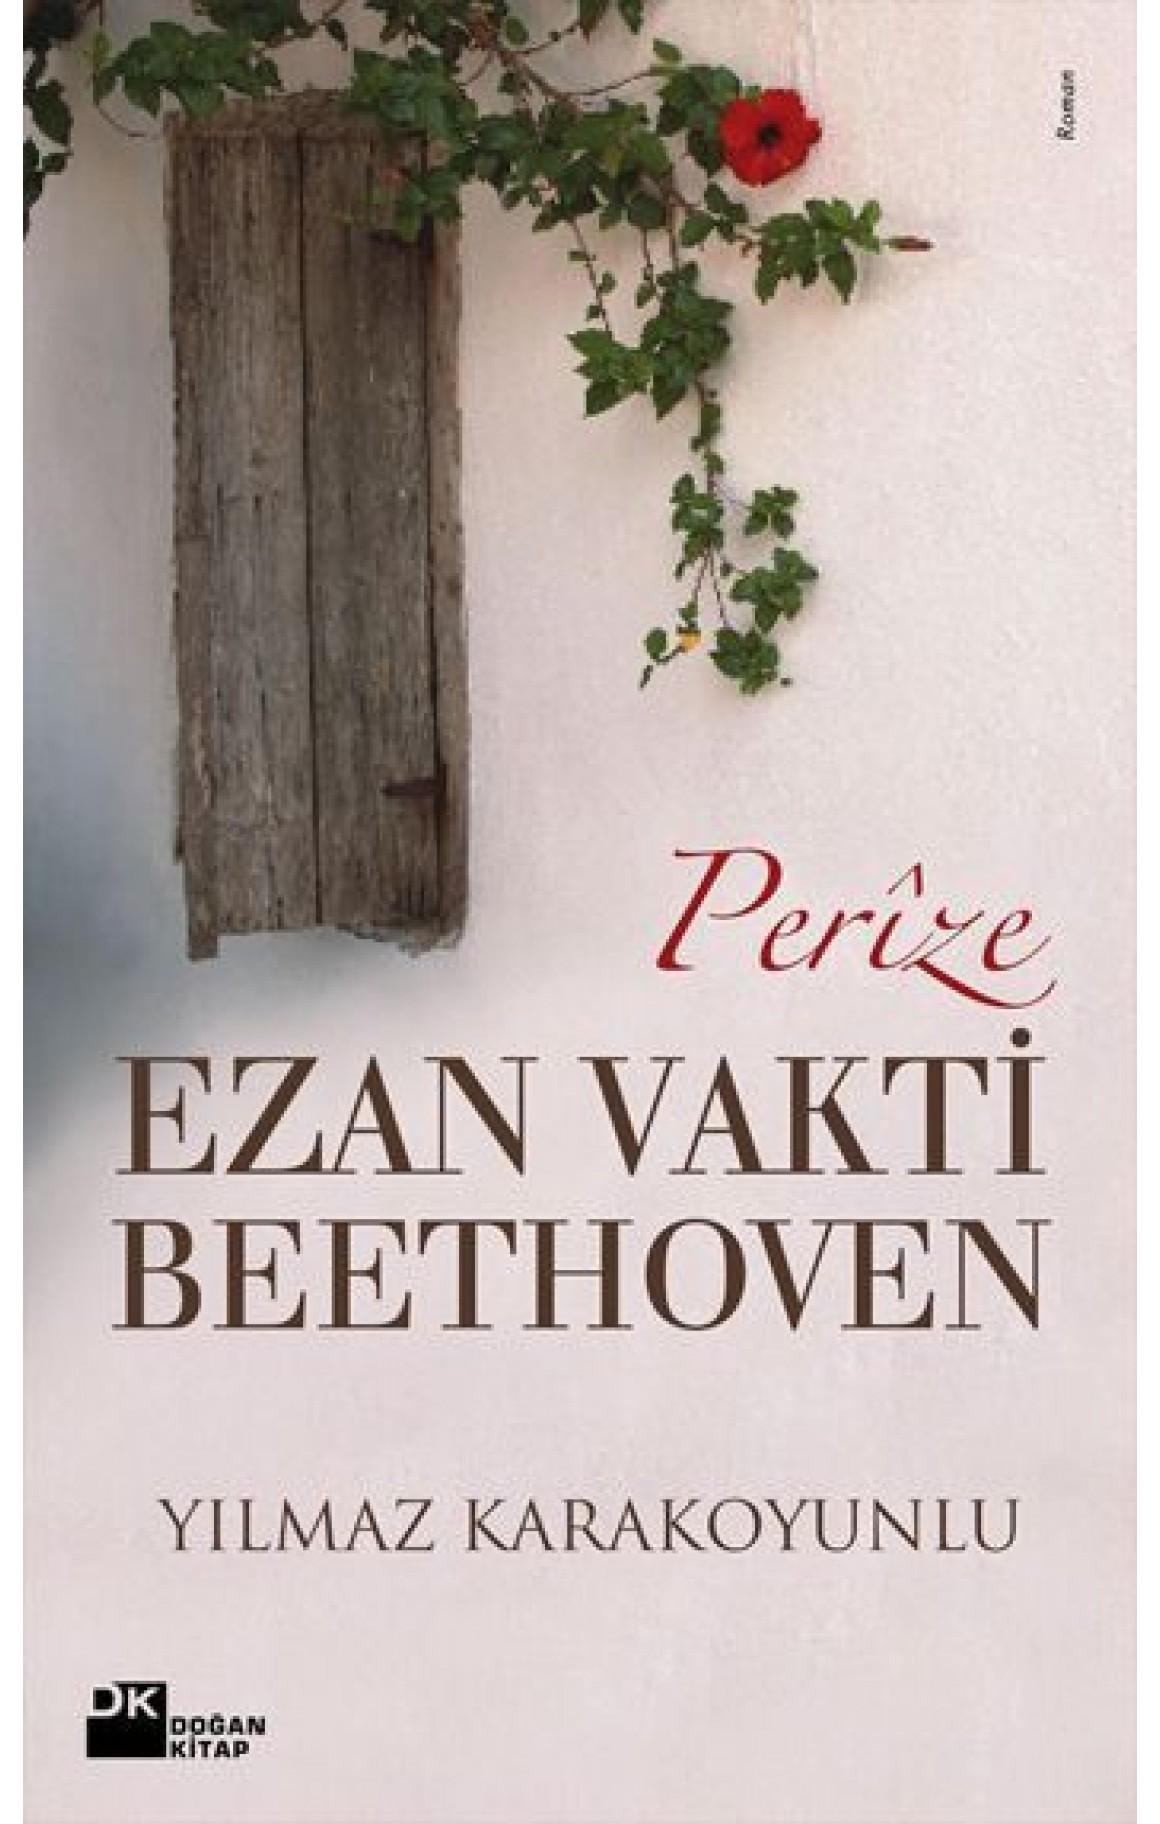 Ezan Vakti Beethoven-Perize